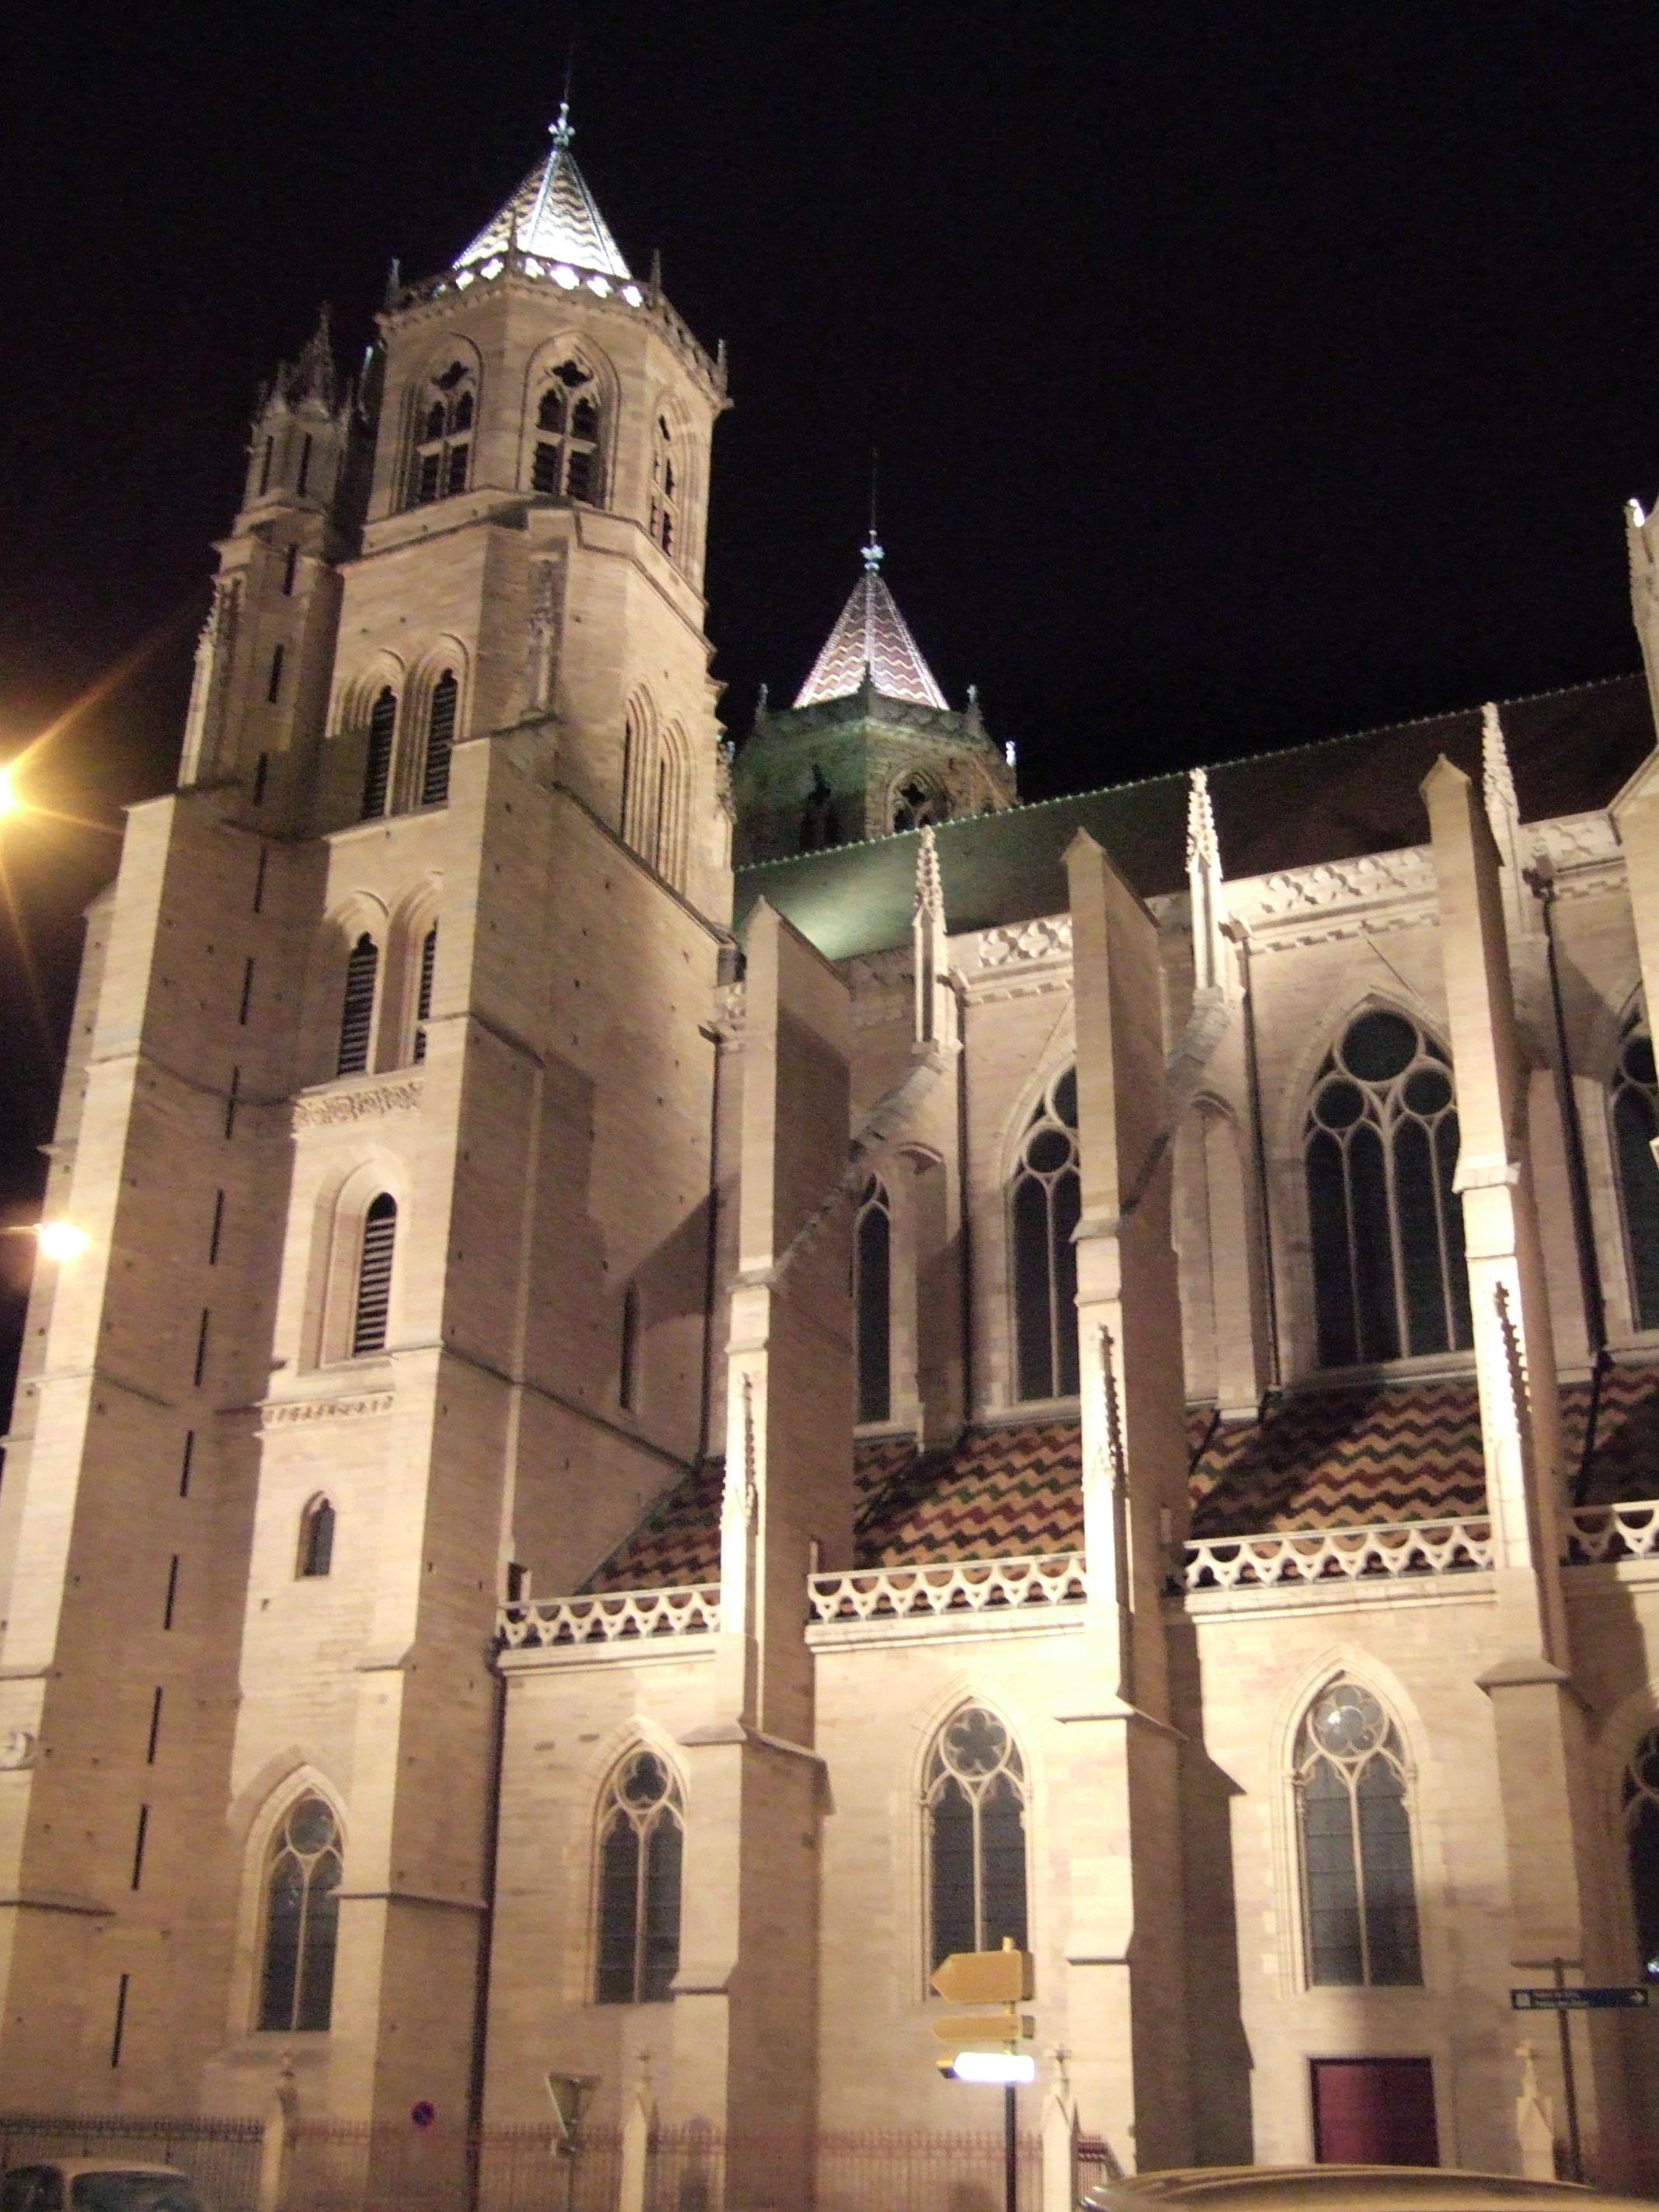 Cathédrale Saint-Bénigne, Dijon